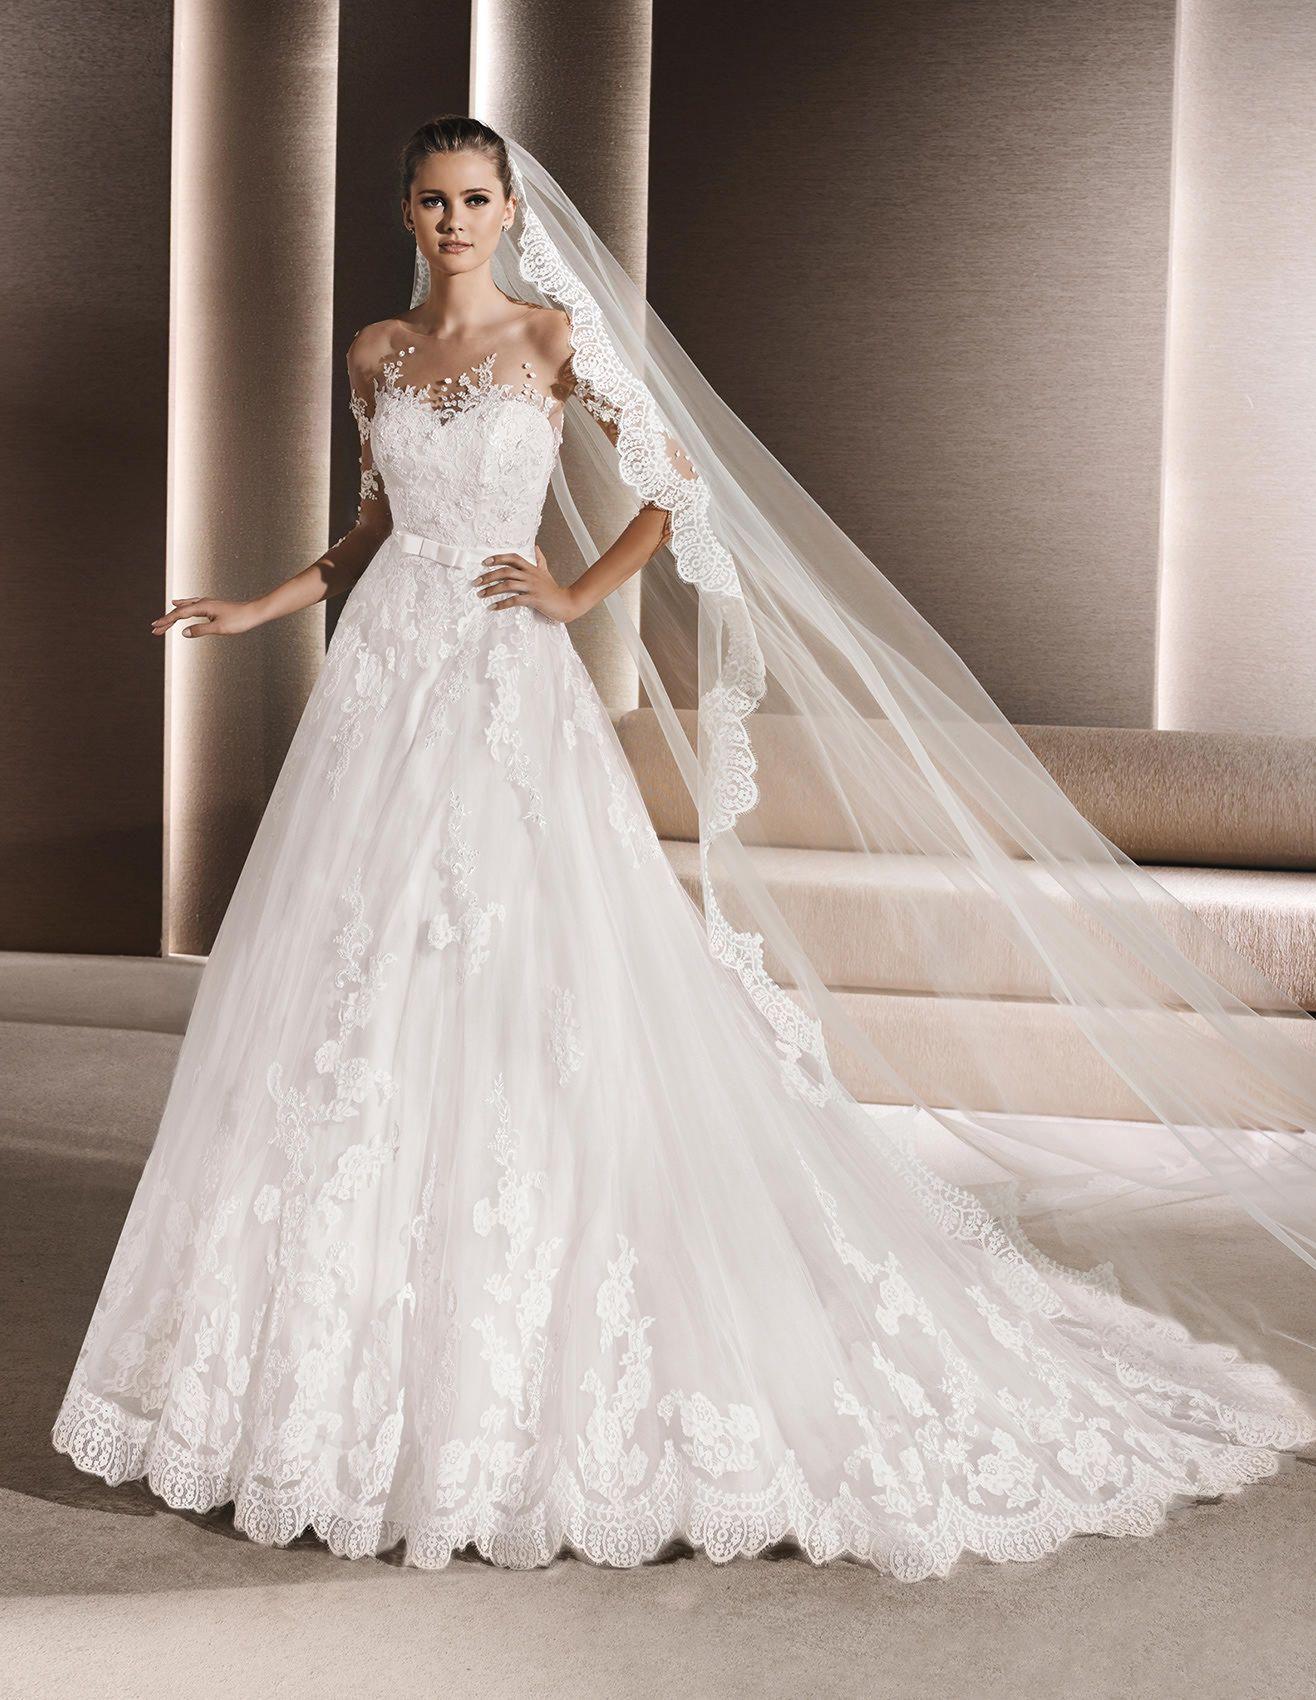 RUPIA - Brautkleid im Prinzessin-Stil aus Spitze | La Sposa ...